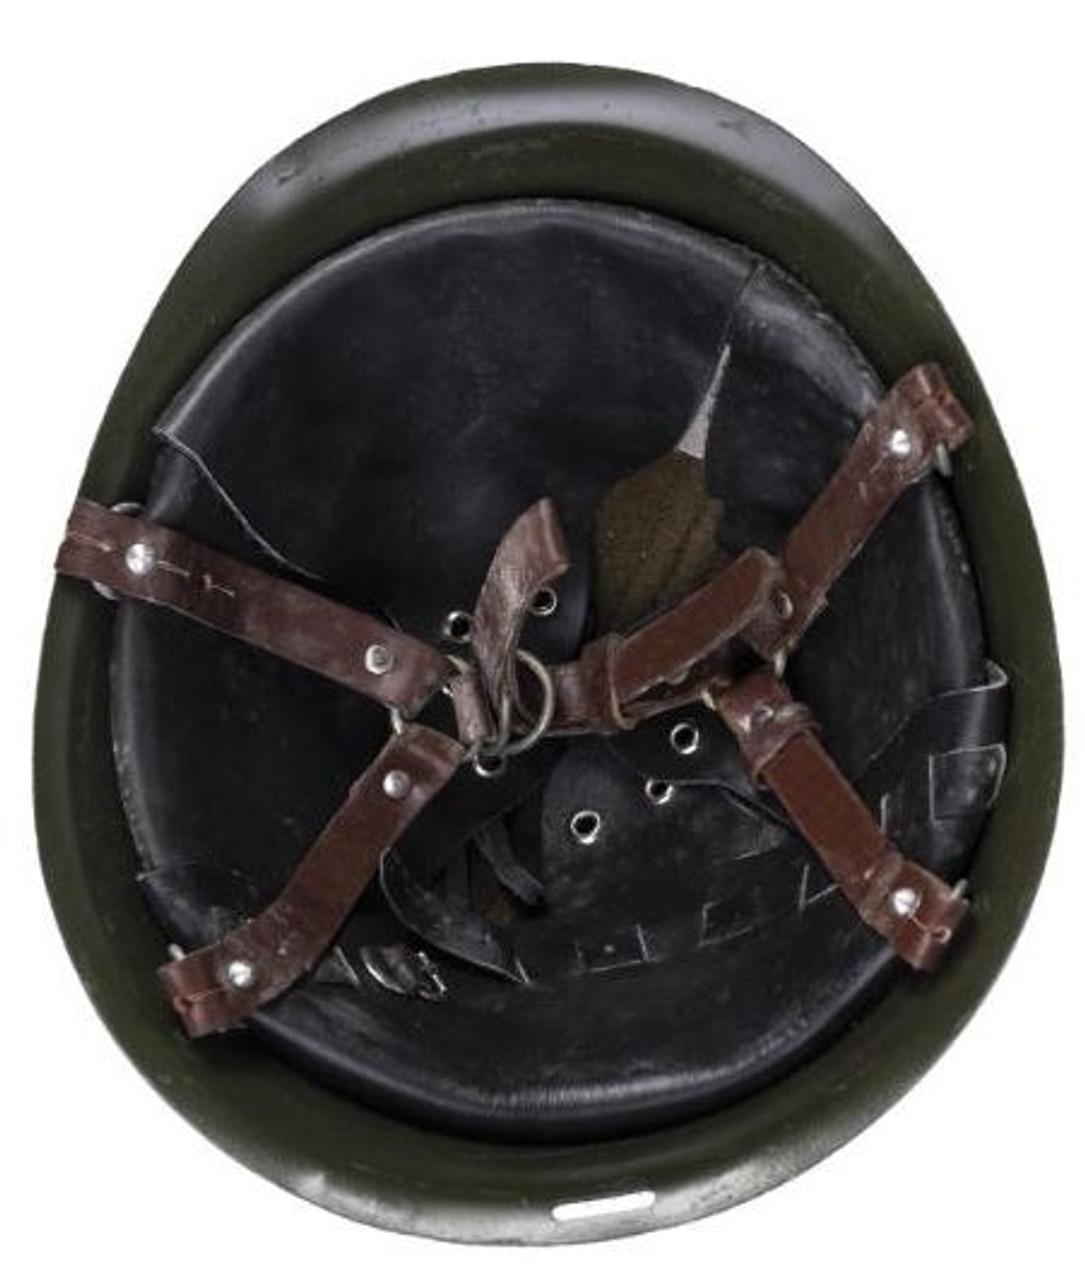 Romanian Army M73 Steel Helmet from Hessen Antique